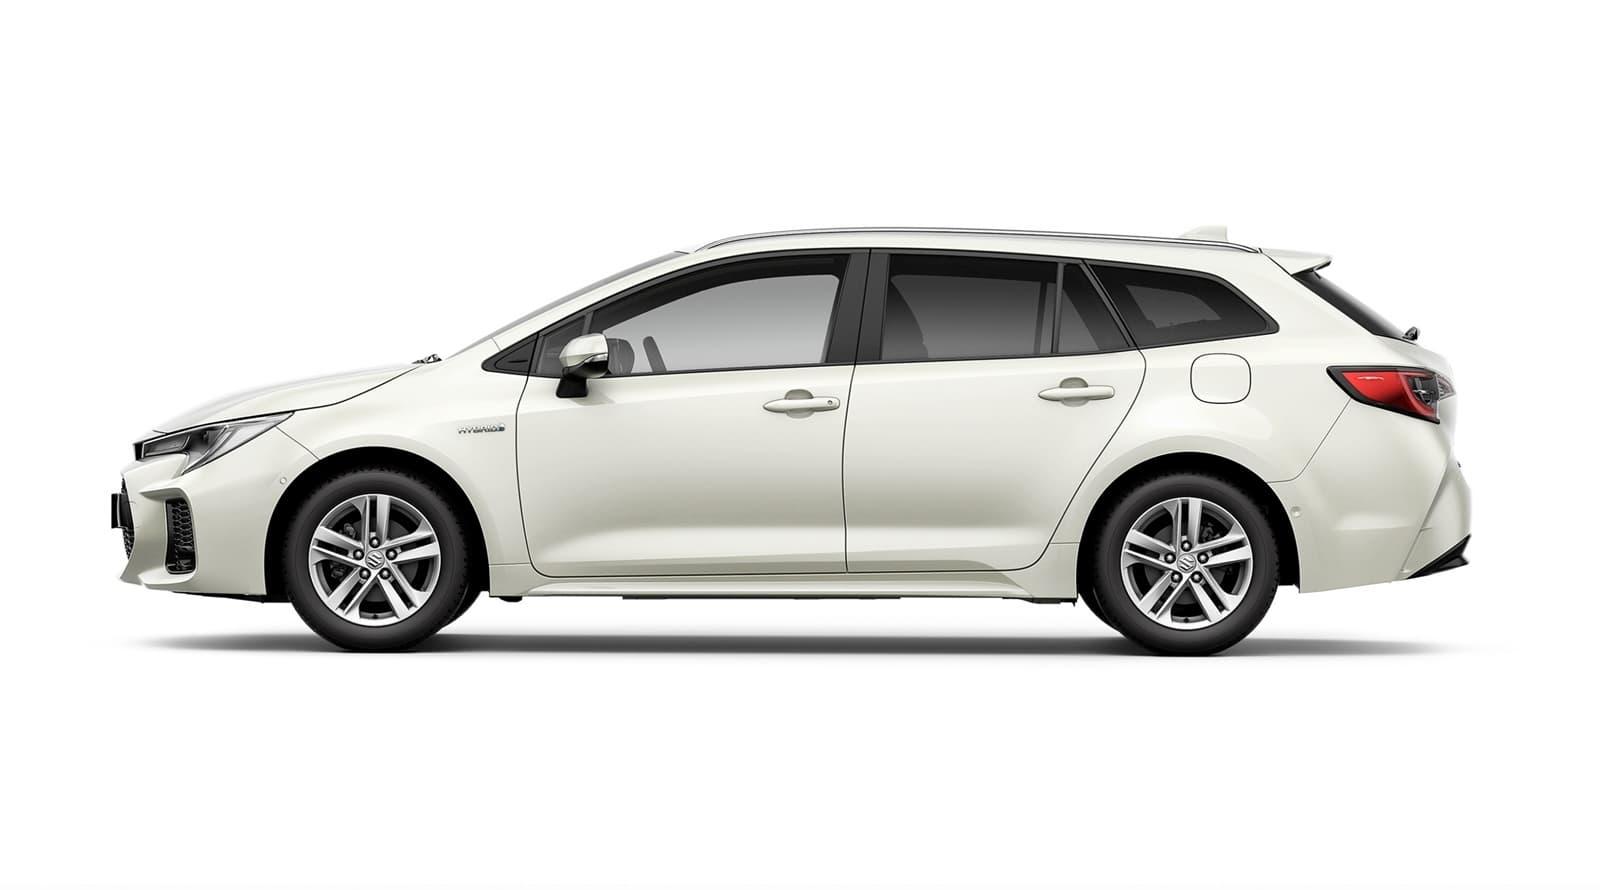 Suzuki Swace 2021 0920 003